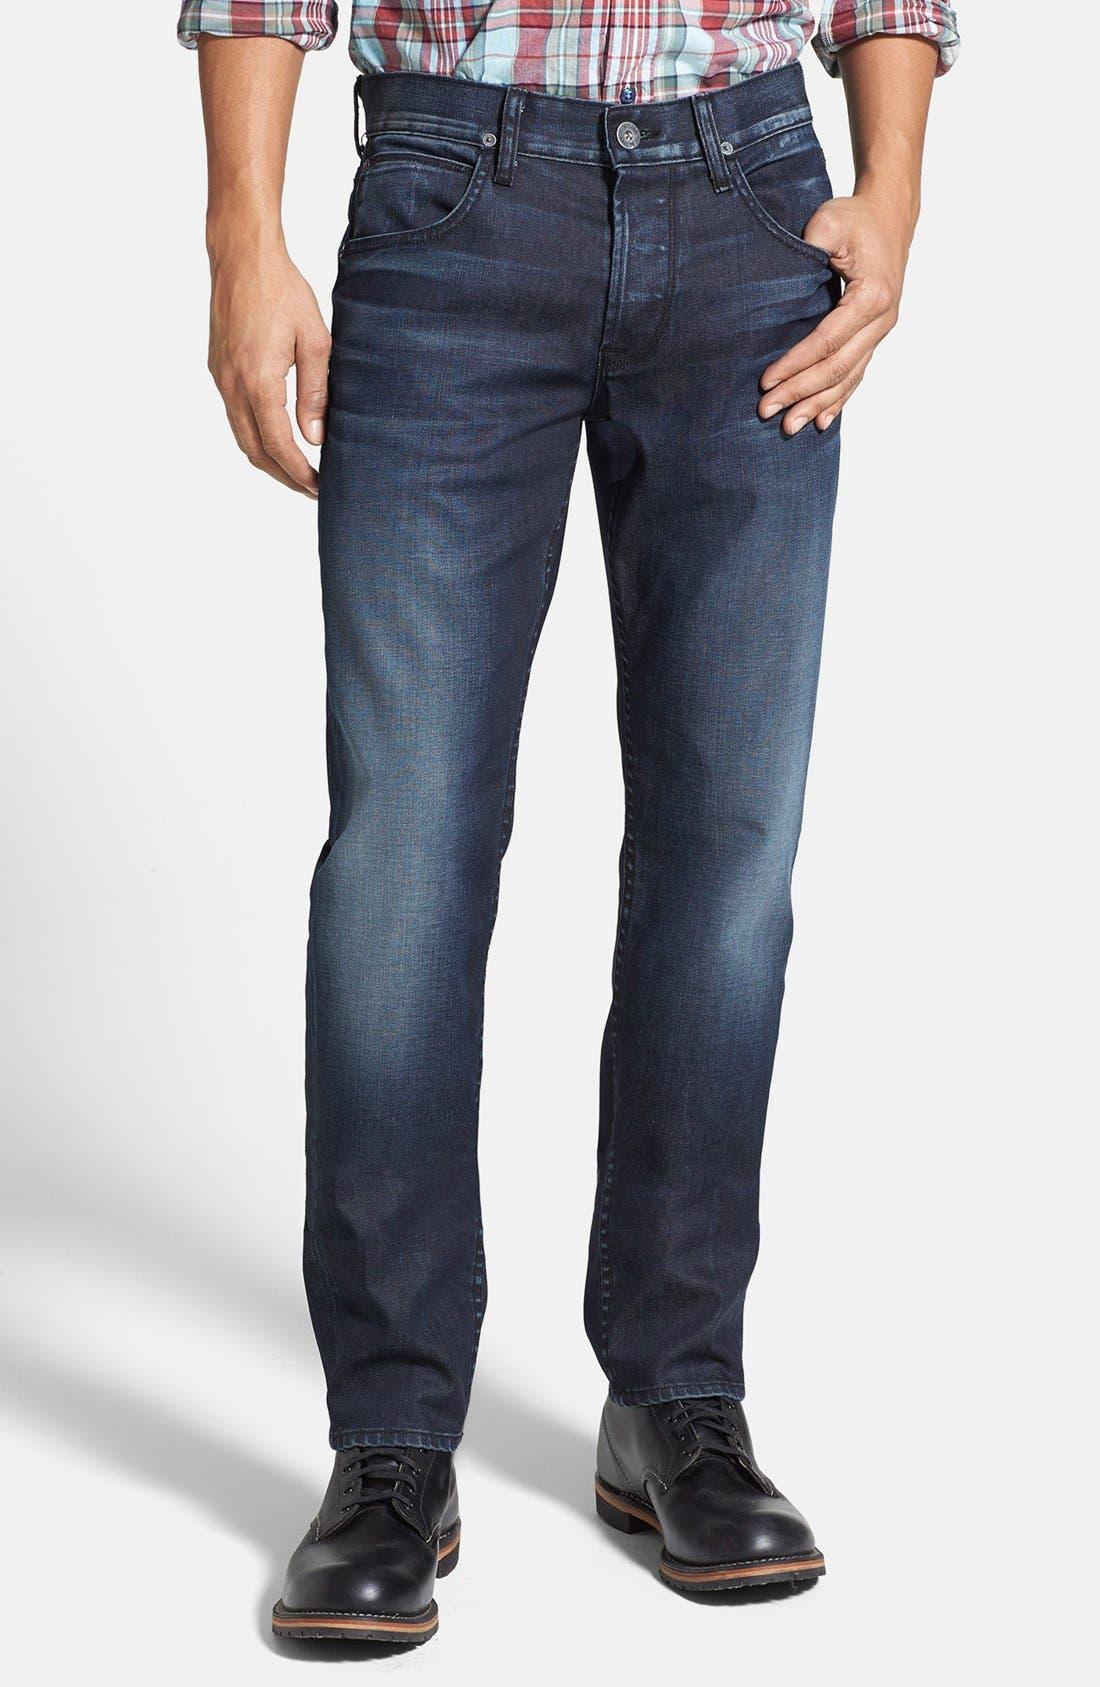 Main Image - Hudson Jeans 'Blake' Slim Straight Leg Jeans (Darkness)